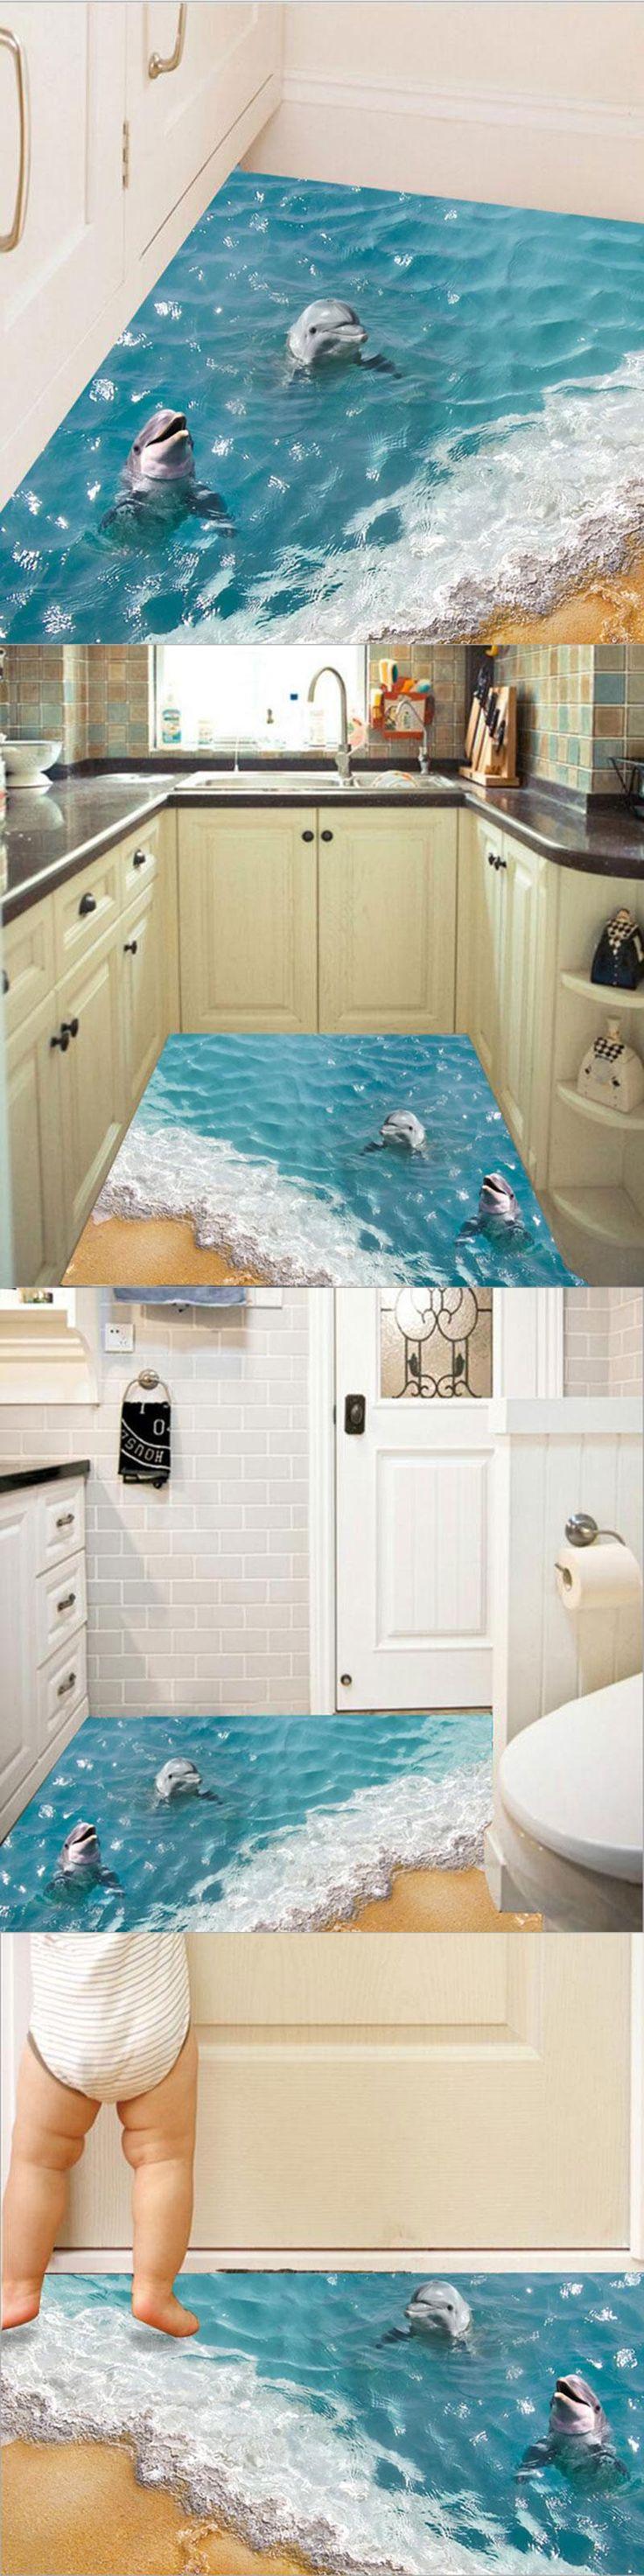 Best 25 Waterproof Flooring Ideas On Pinterest